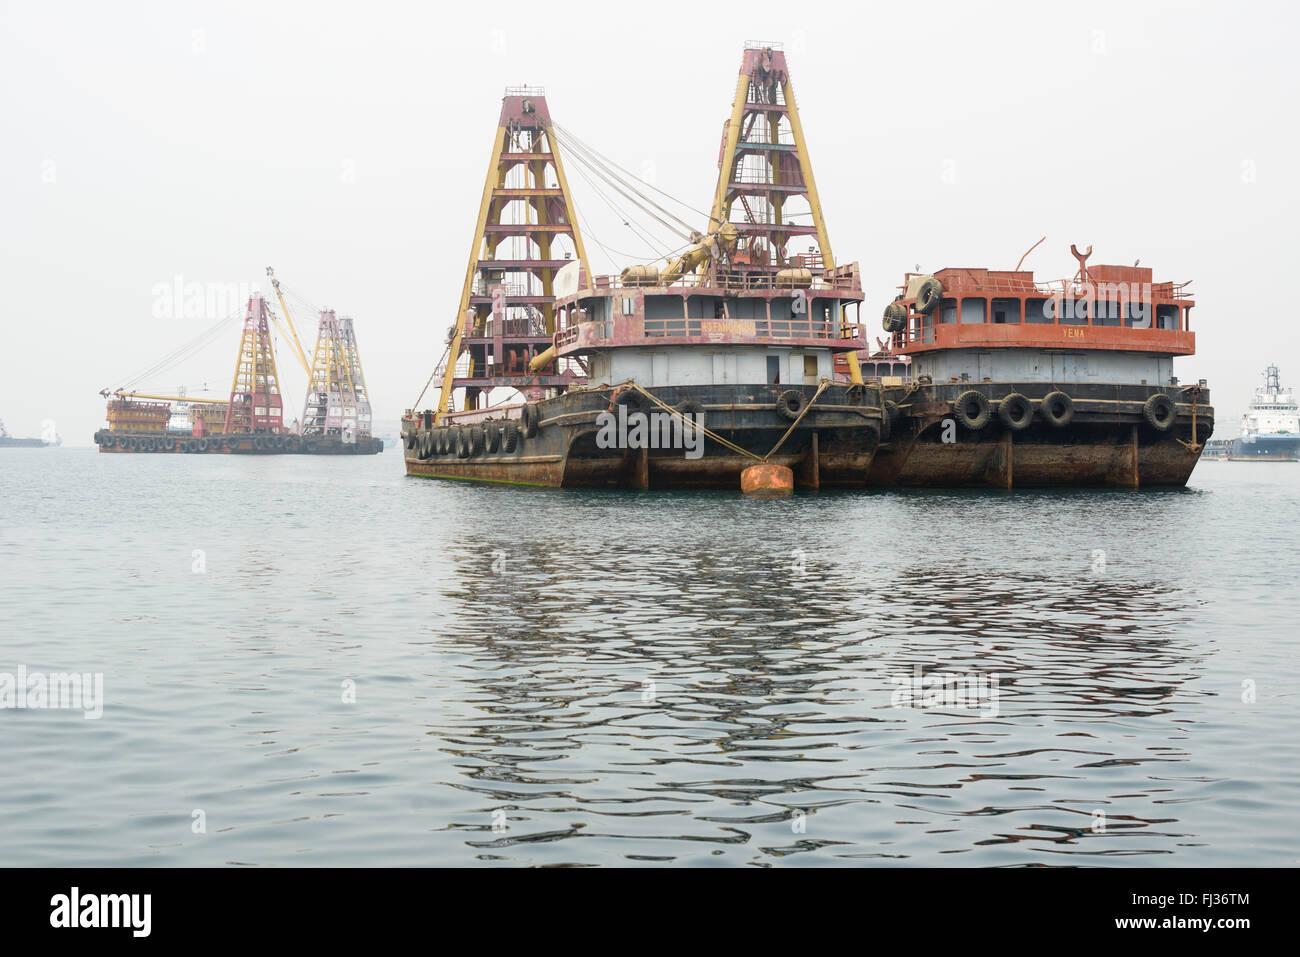 Ships in Luanda Bay, Angola, Africa - Stock Image